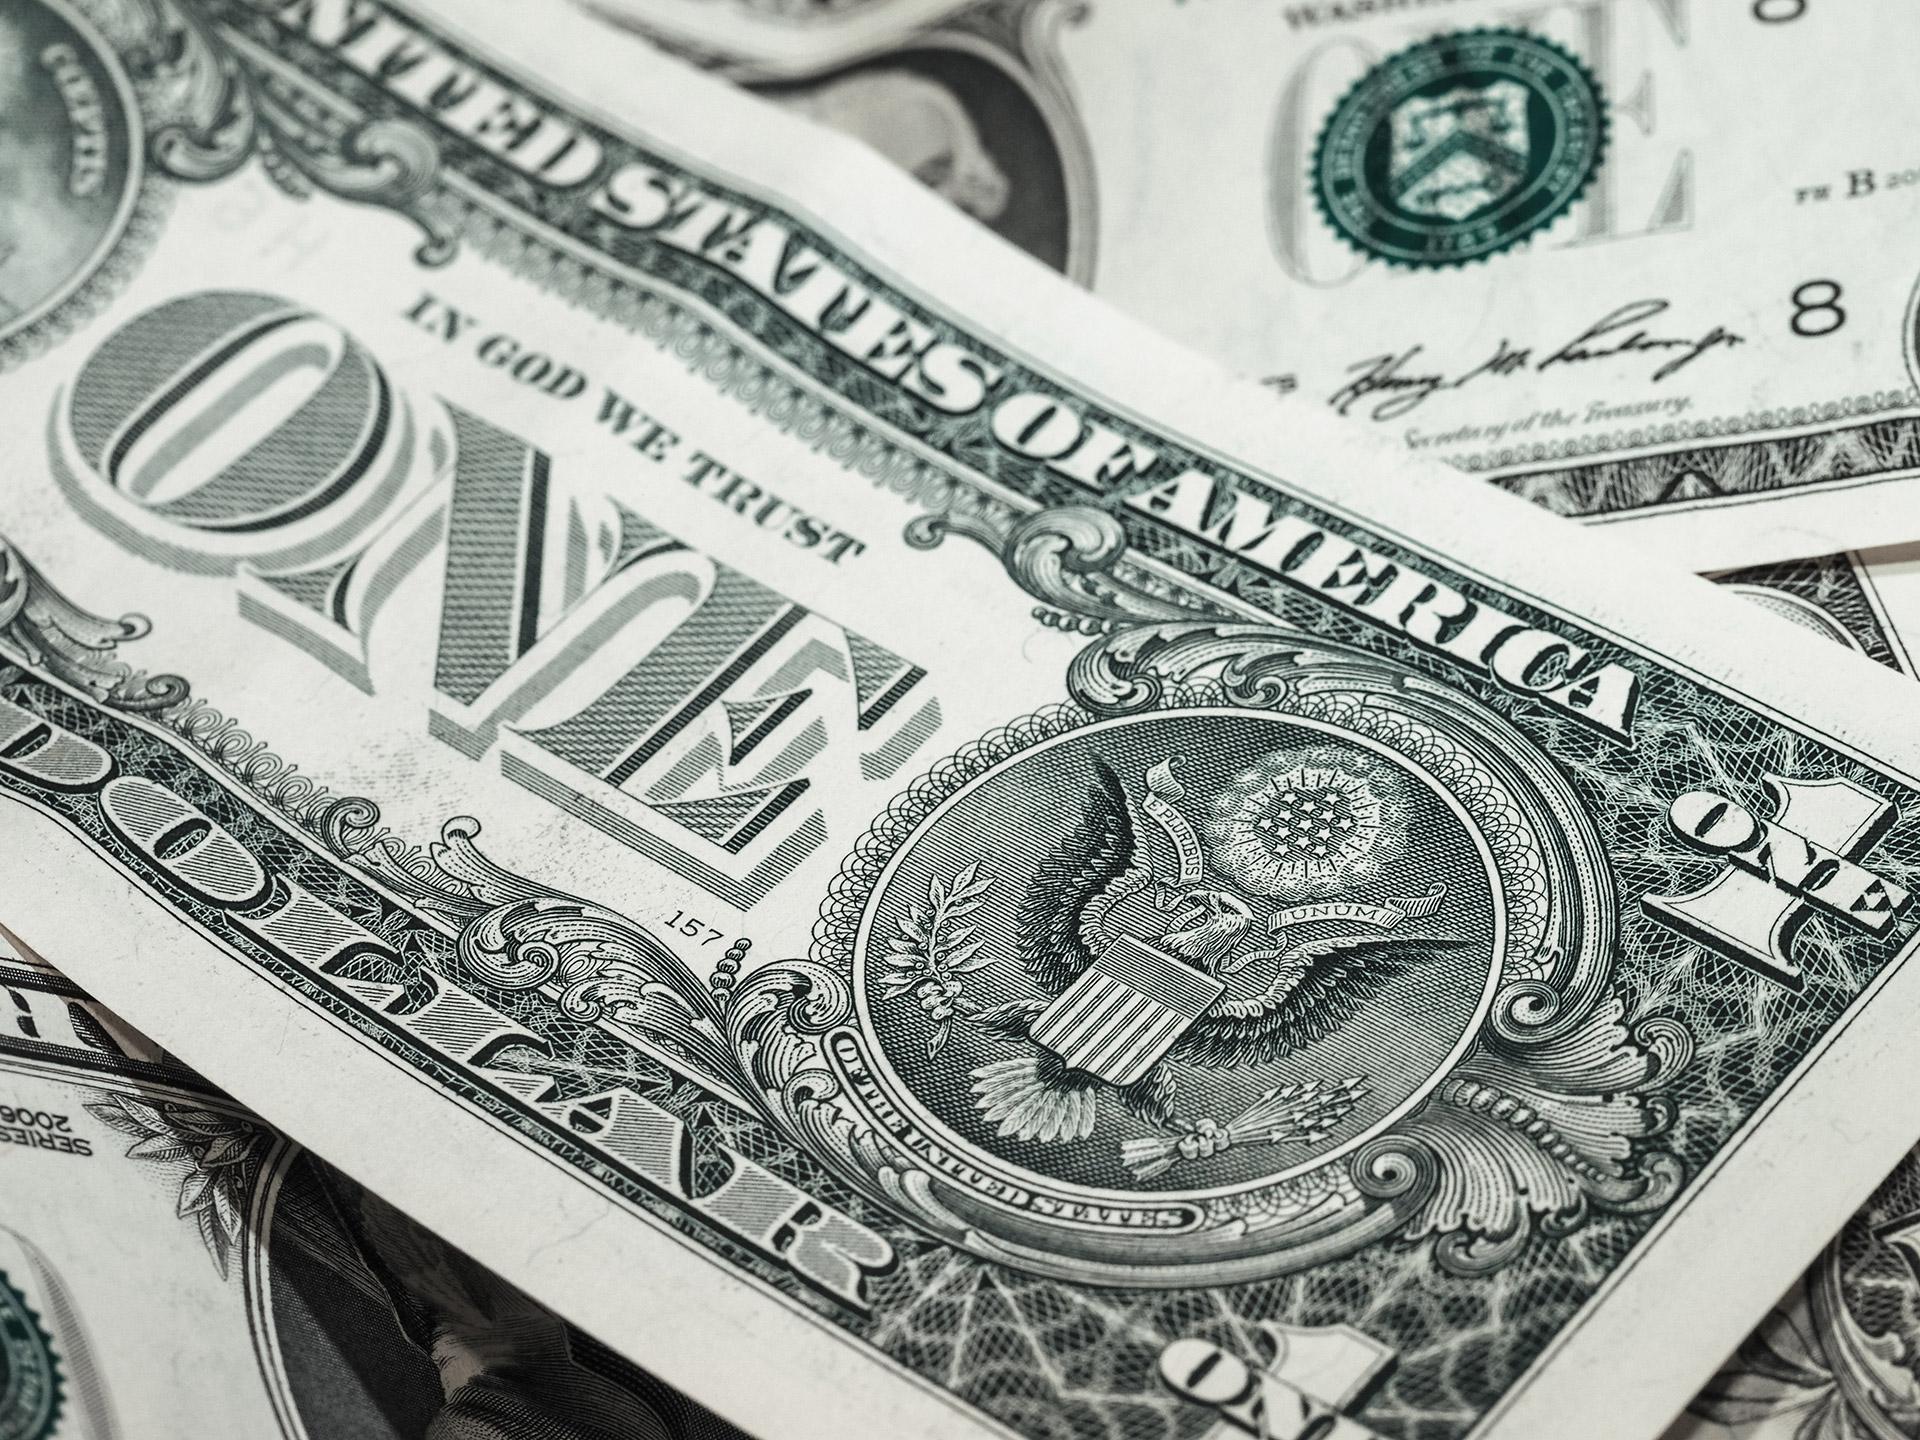 bank-note-bills-budget-164661